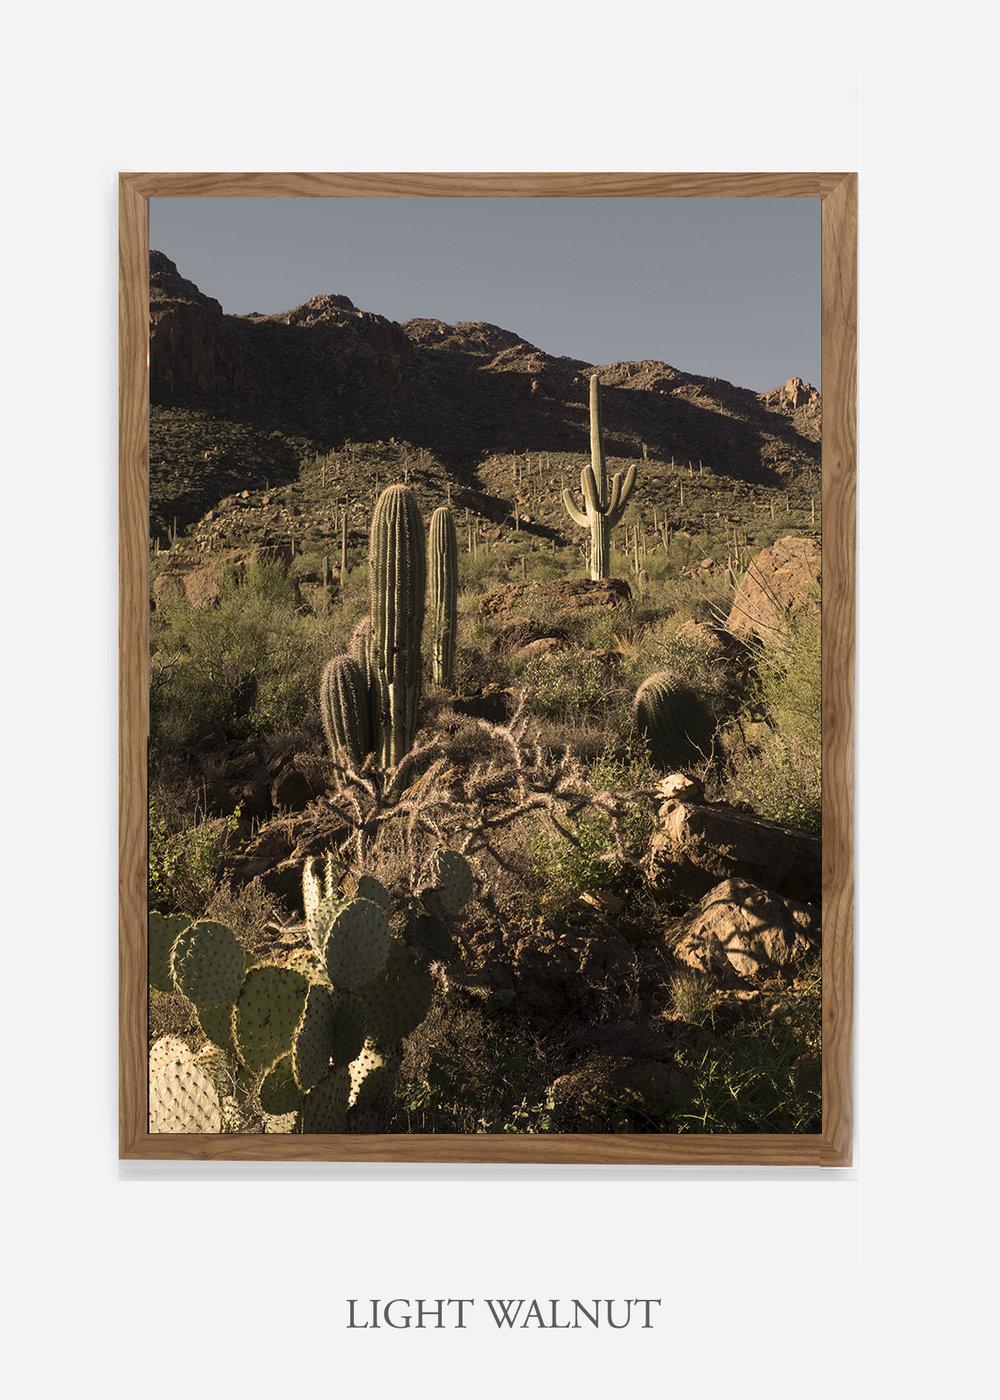 nomat-lightwalnutframe-saguaroNo.18-wildercalifornia-art-wallart-cactusprint-homedecor-prints-arizona-botanical-artwork-interiordesign.jpg